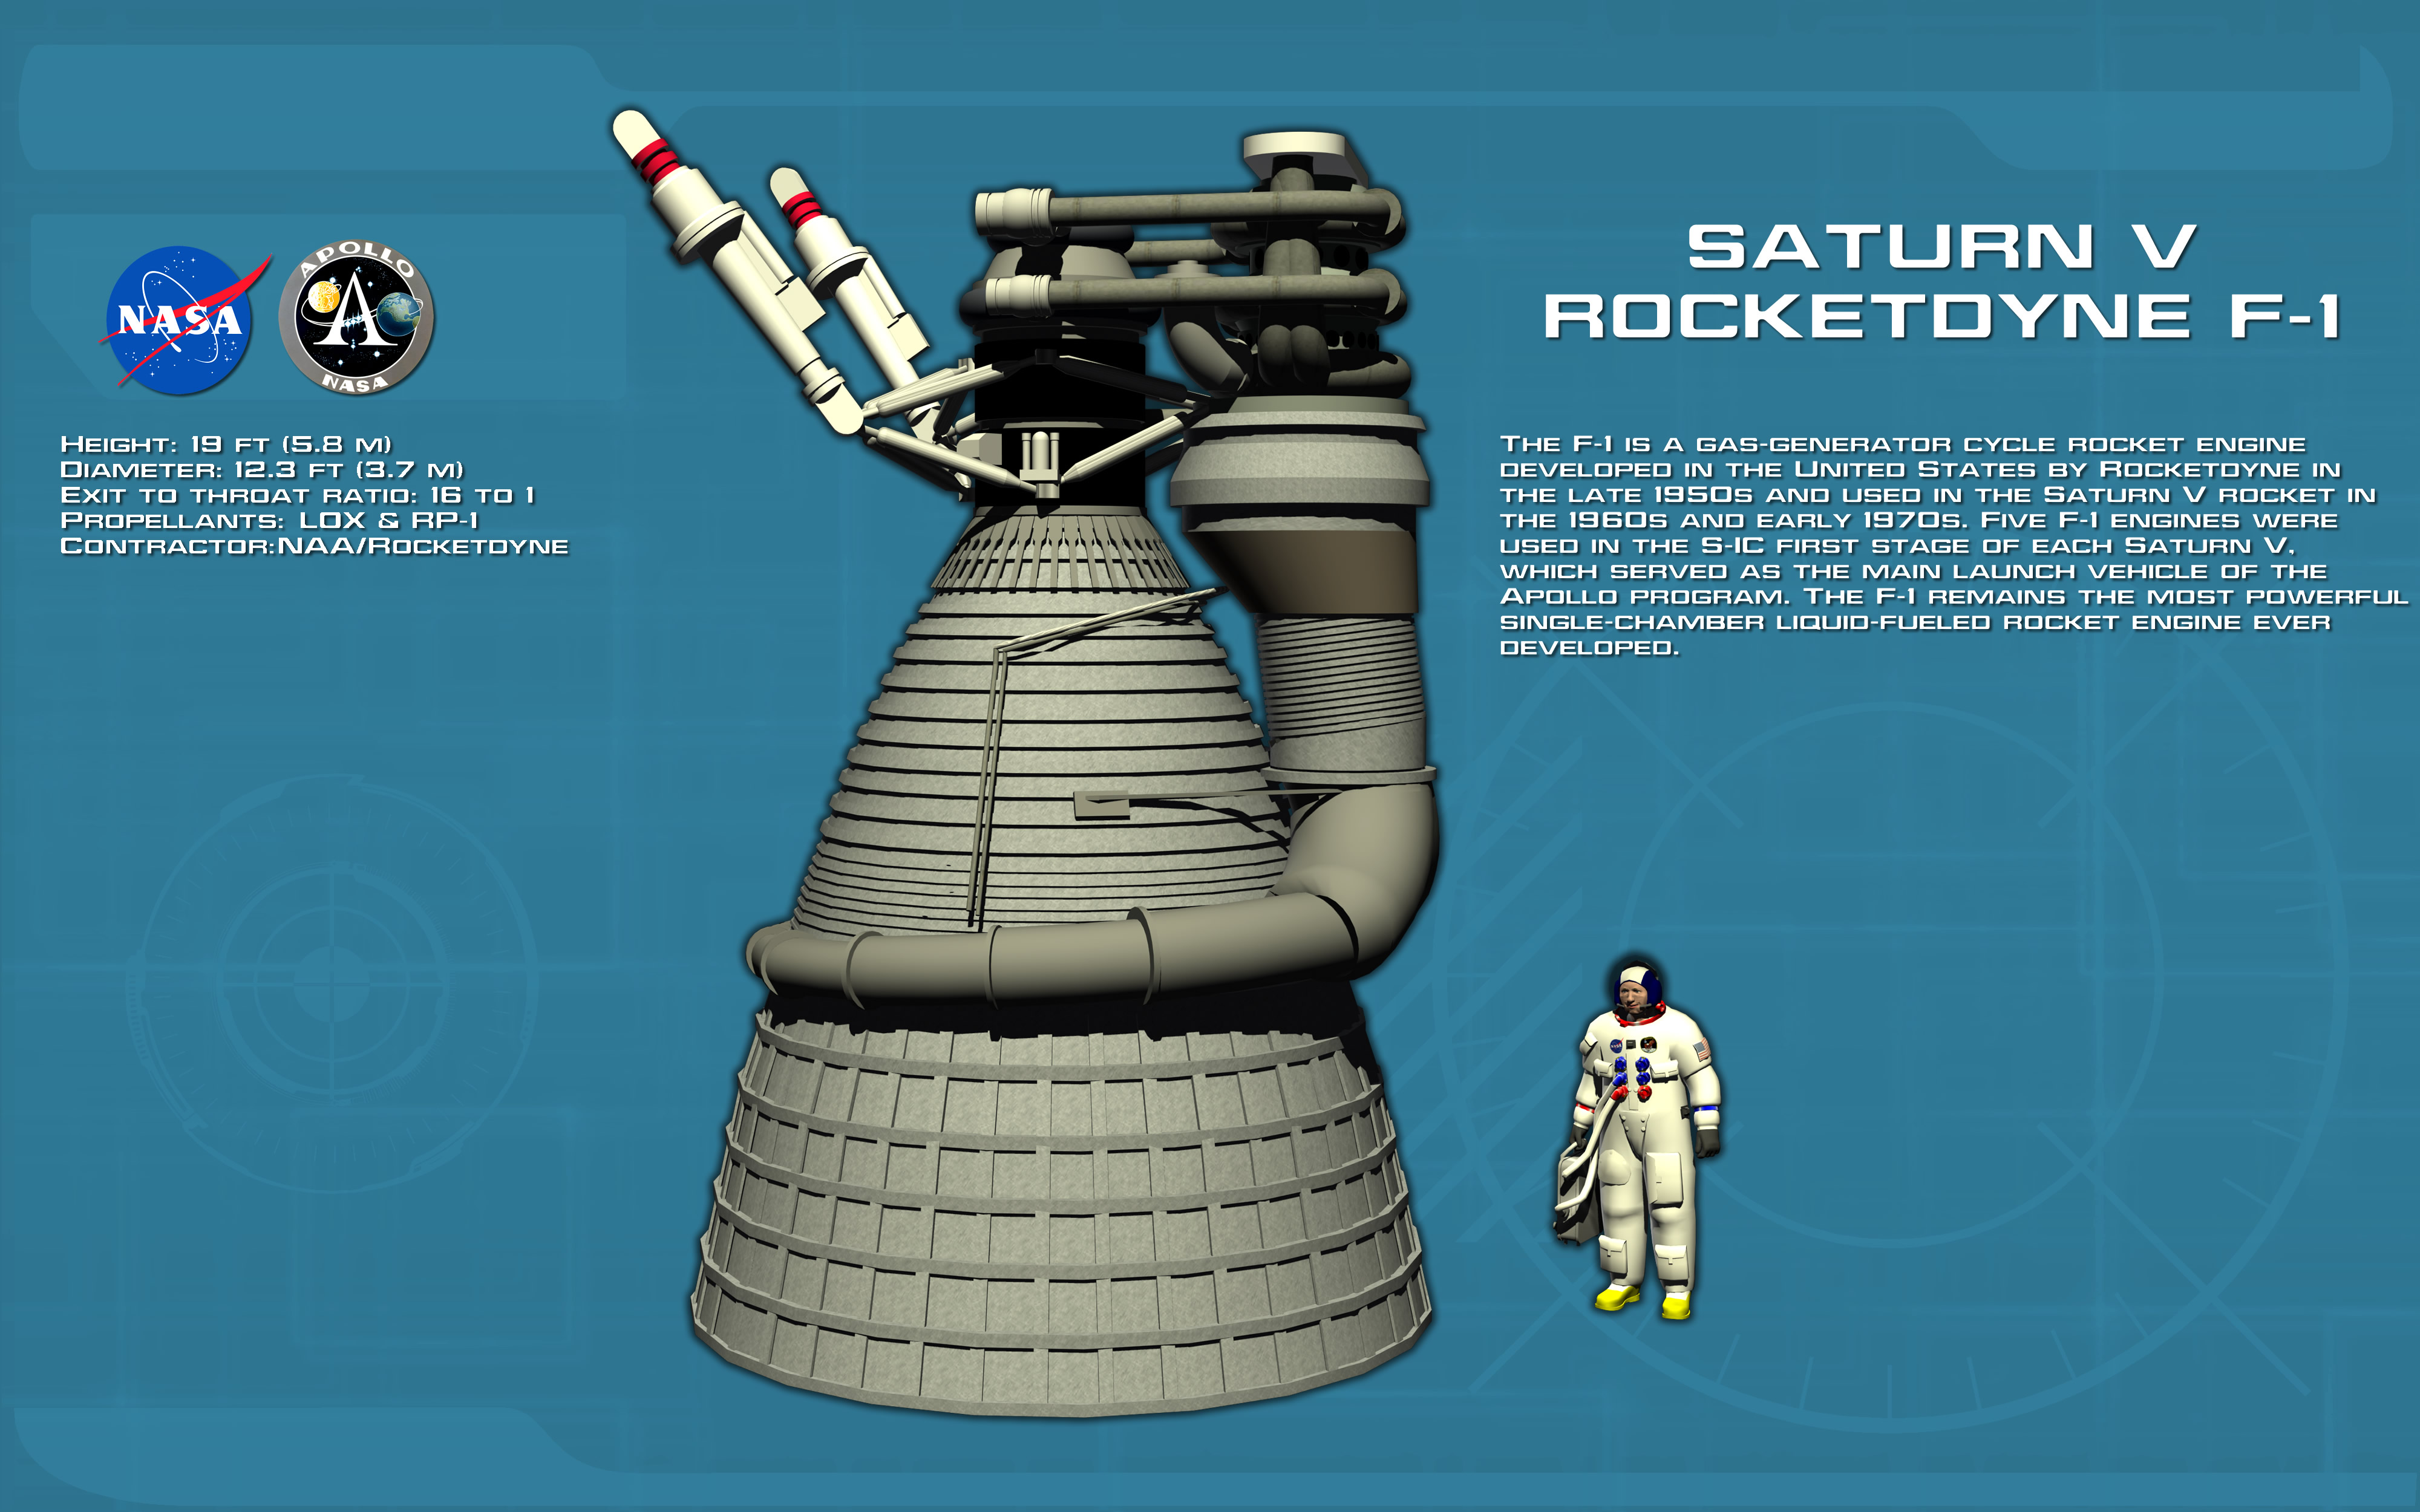 saturn 5 rocket engine diagram get free image about wiring diagram